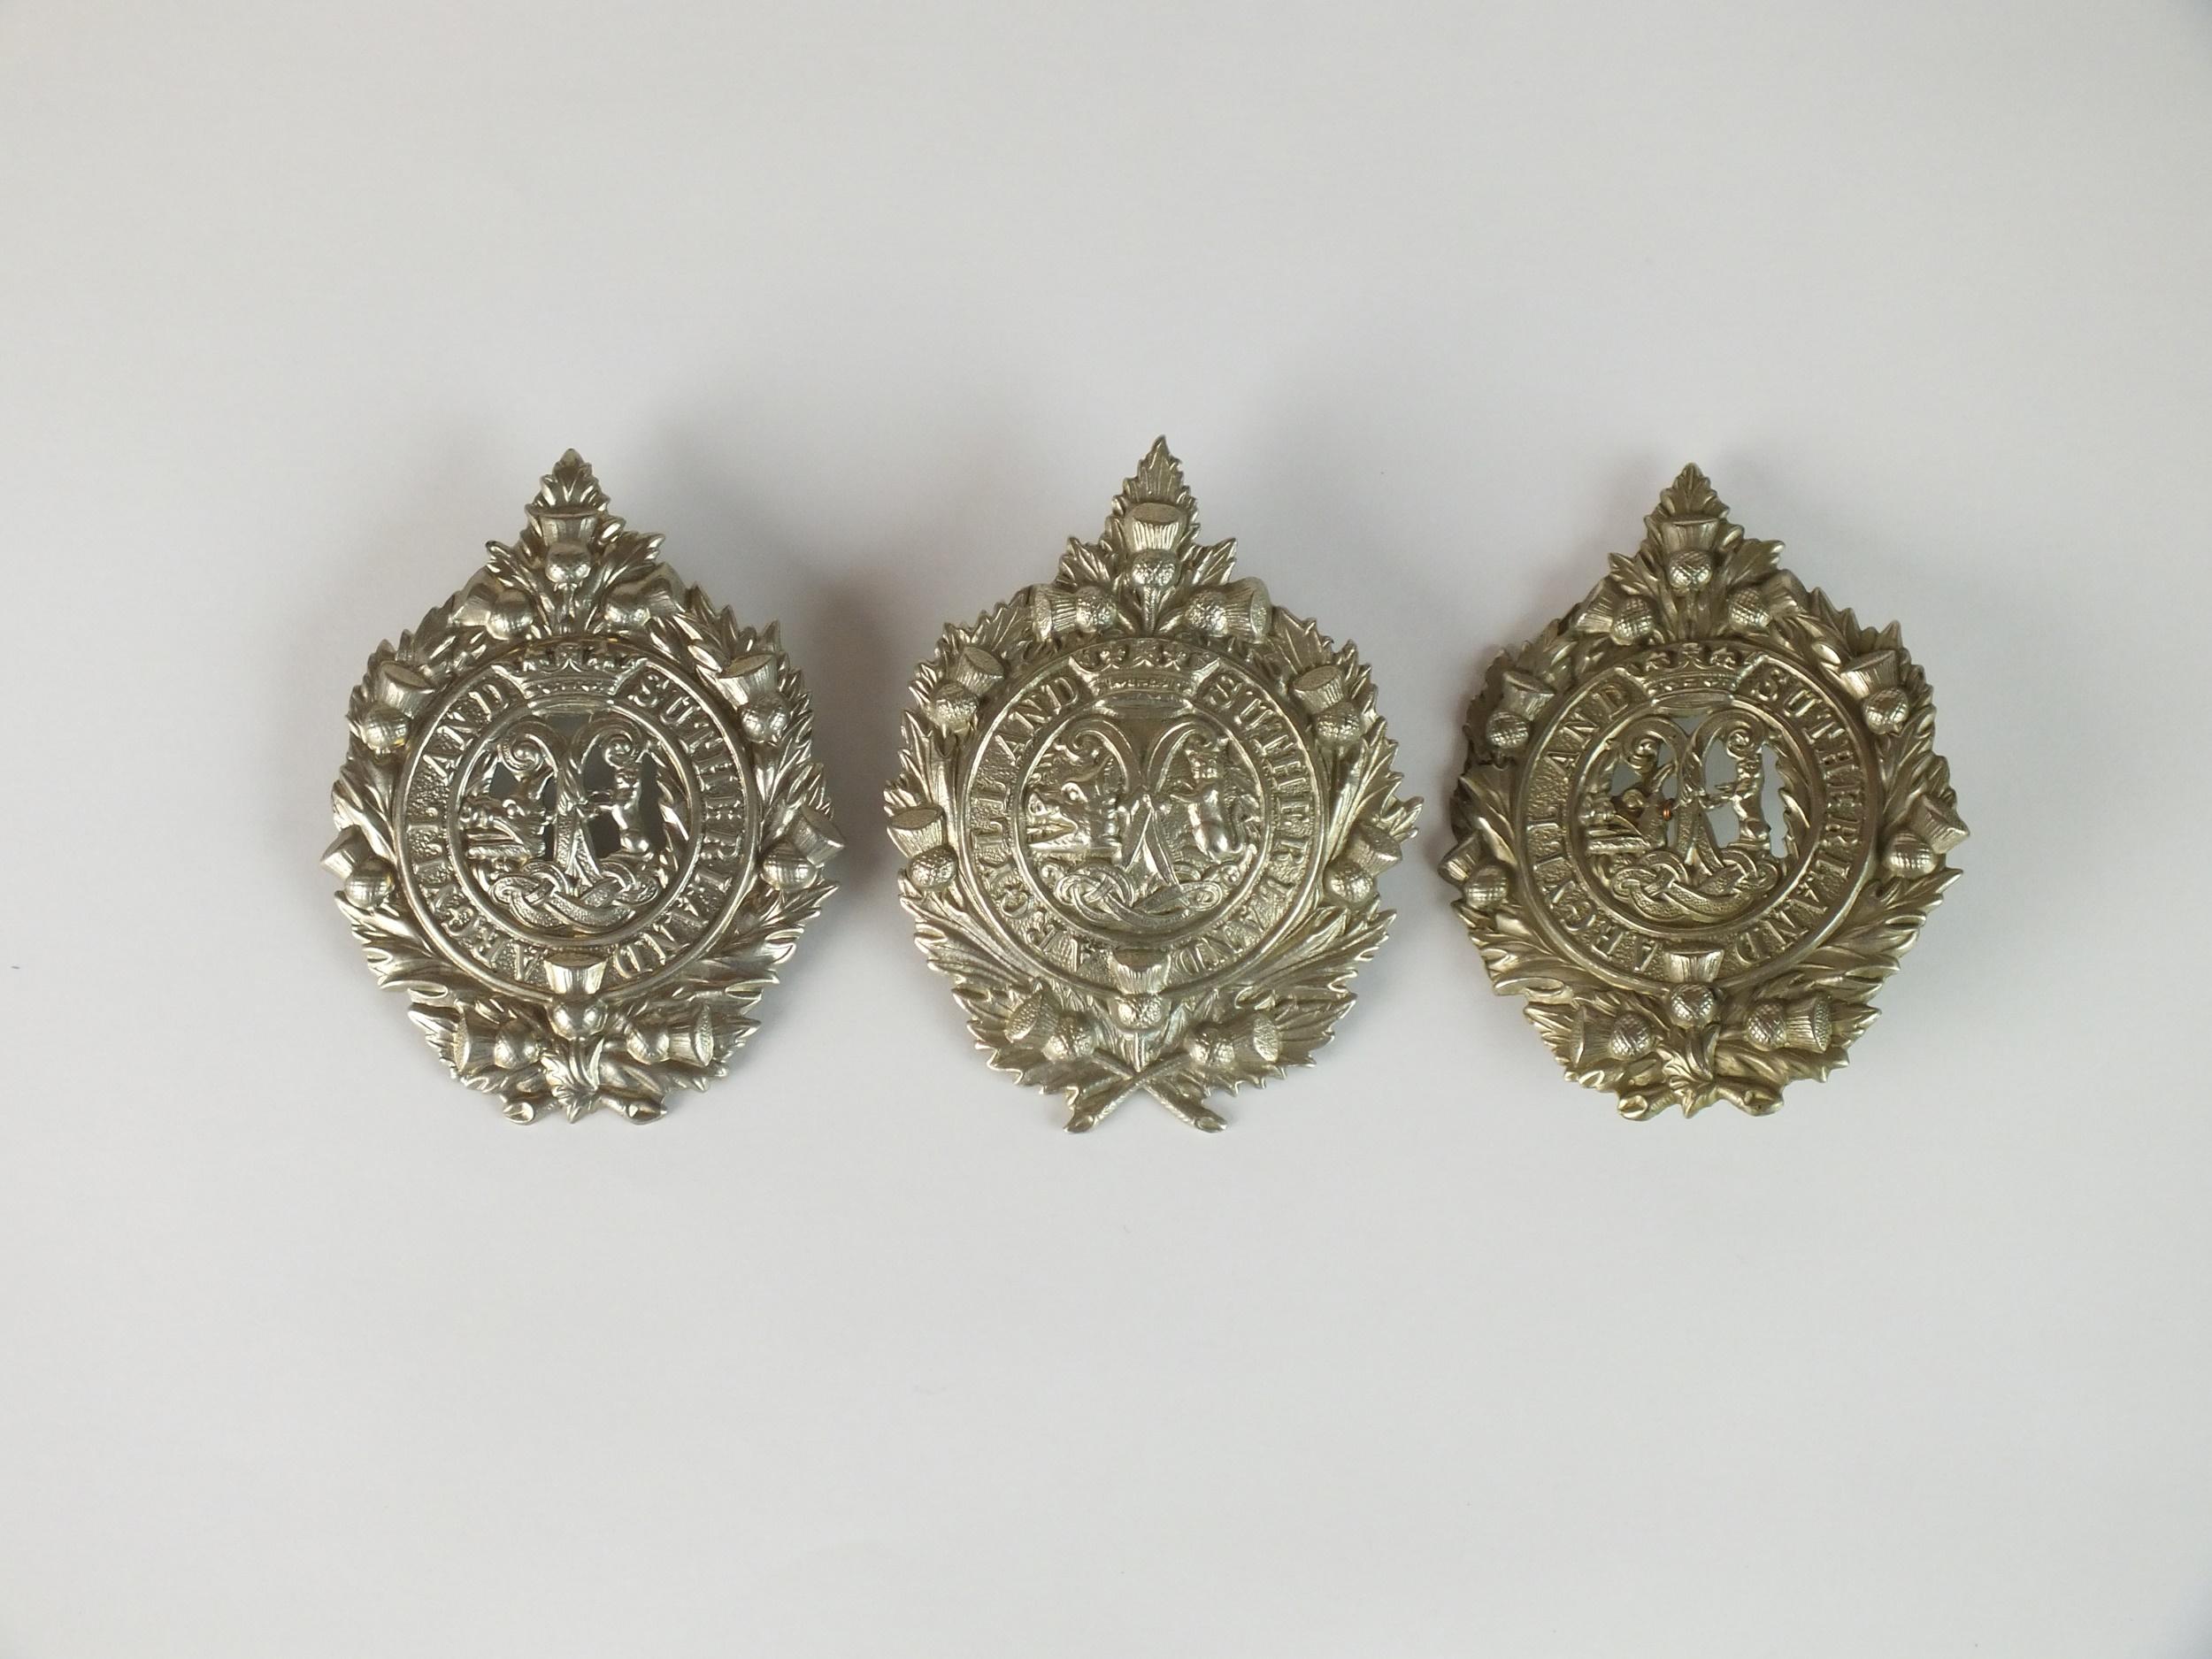 Three Argyll and Sutherland glengarry badges, die-stamped white metal (3)